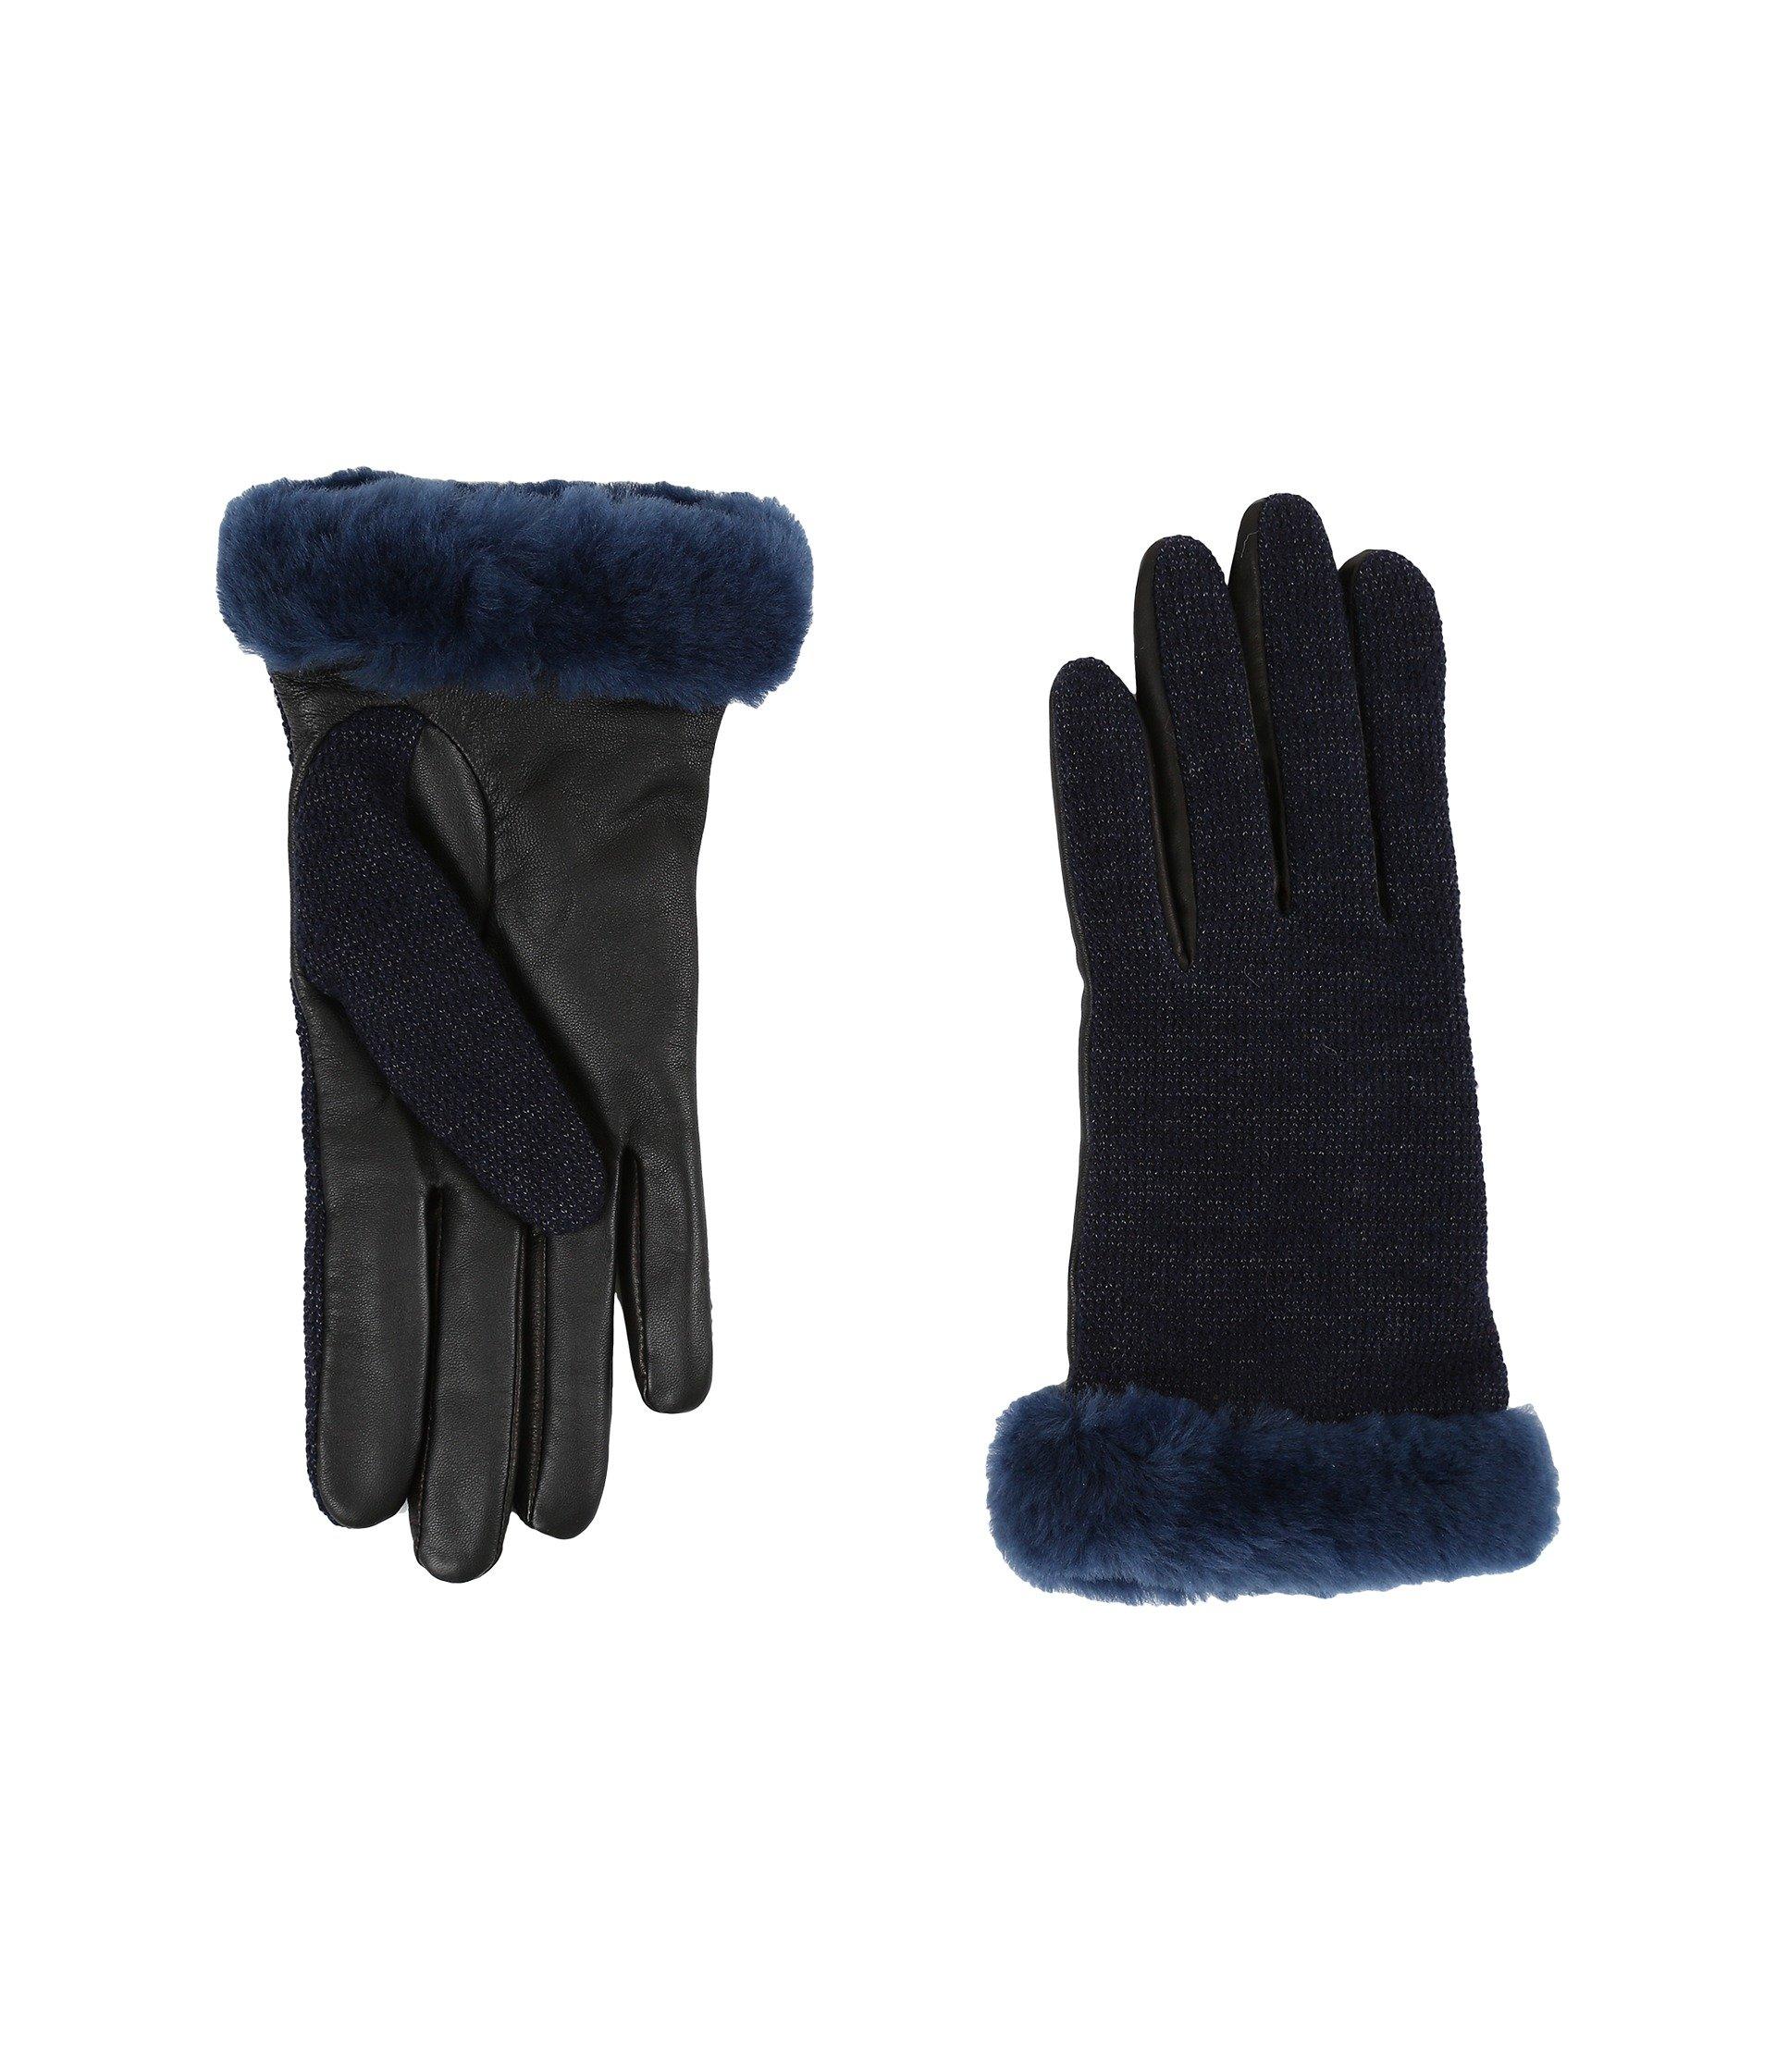 Guantes para Mujer UGG Shorty Smart Fabric Gloves w/ Short Pile Trim  + UGG en VeoyCompro.net